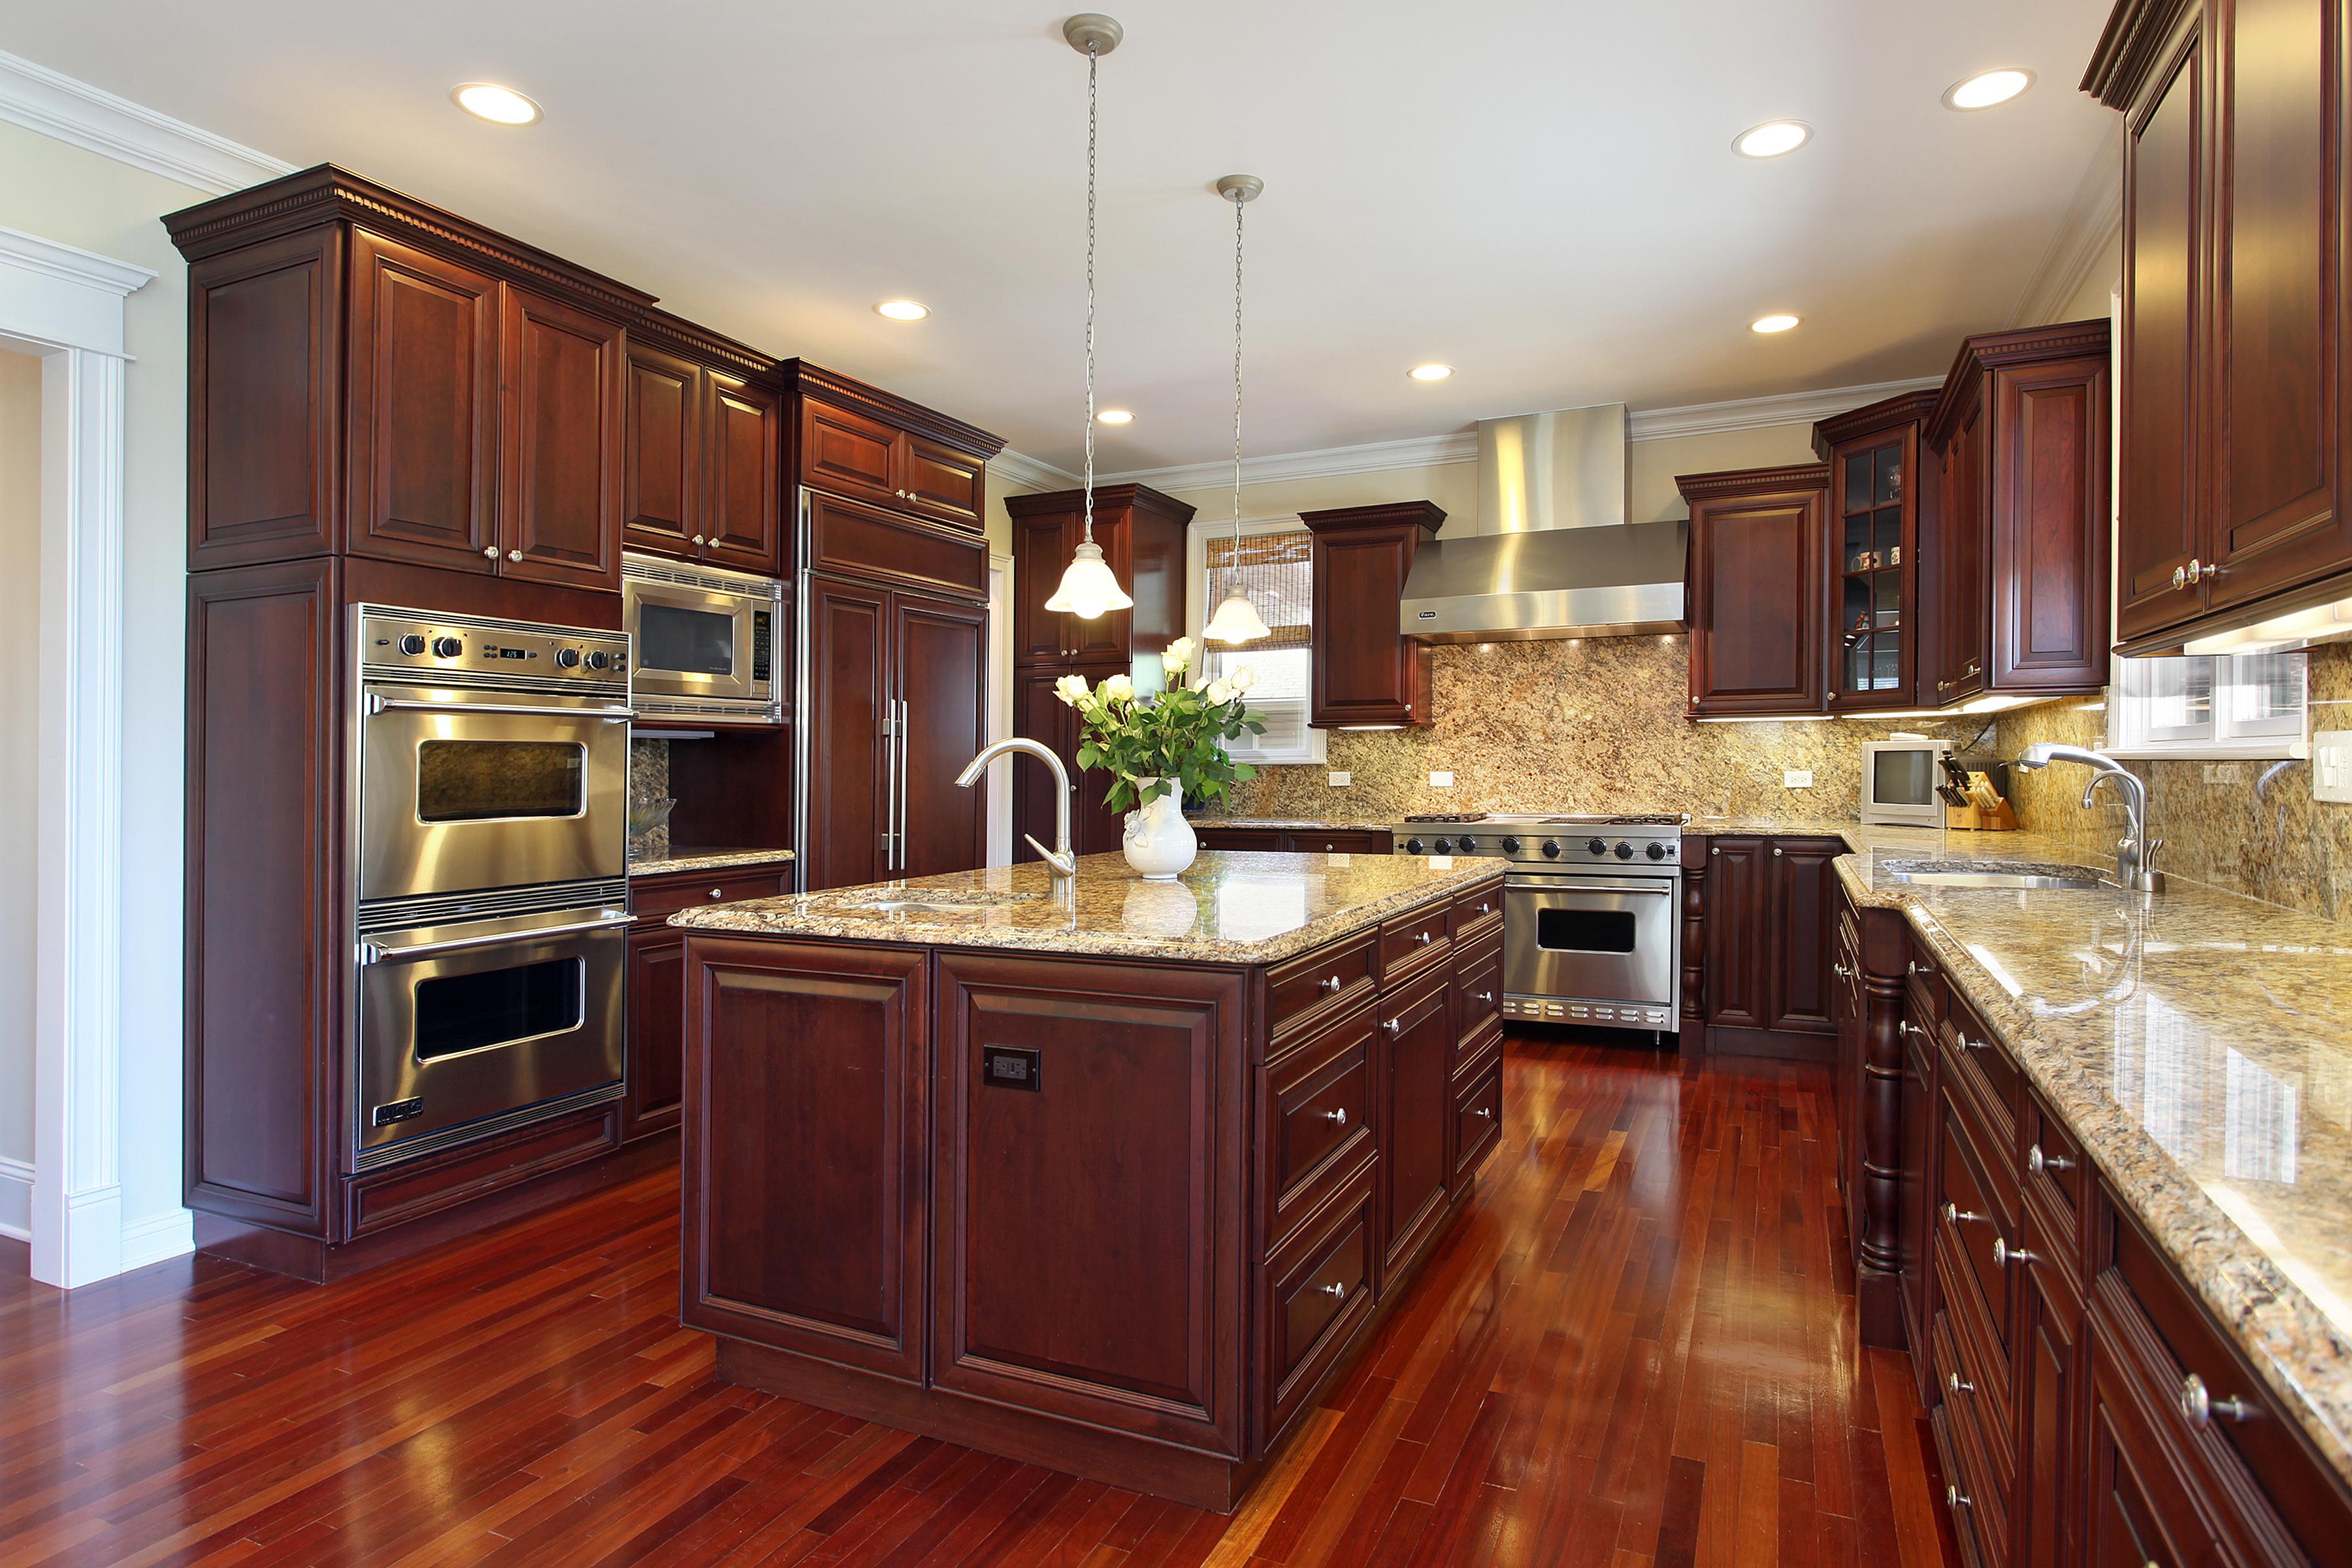 Kitchen Remodel with dark walnut cabinets and luxury granite countertops